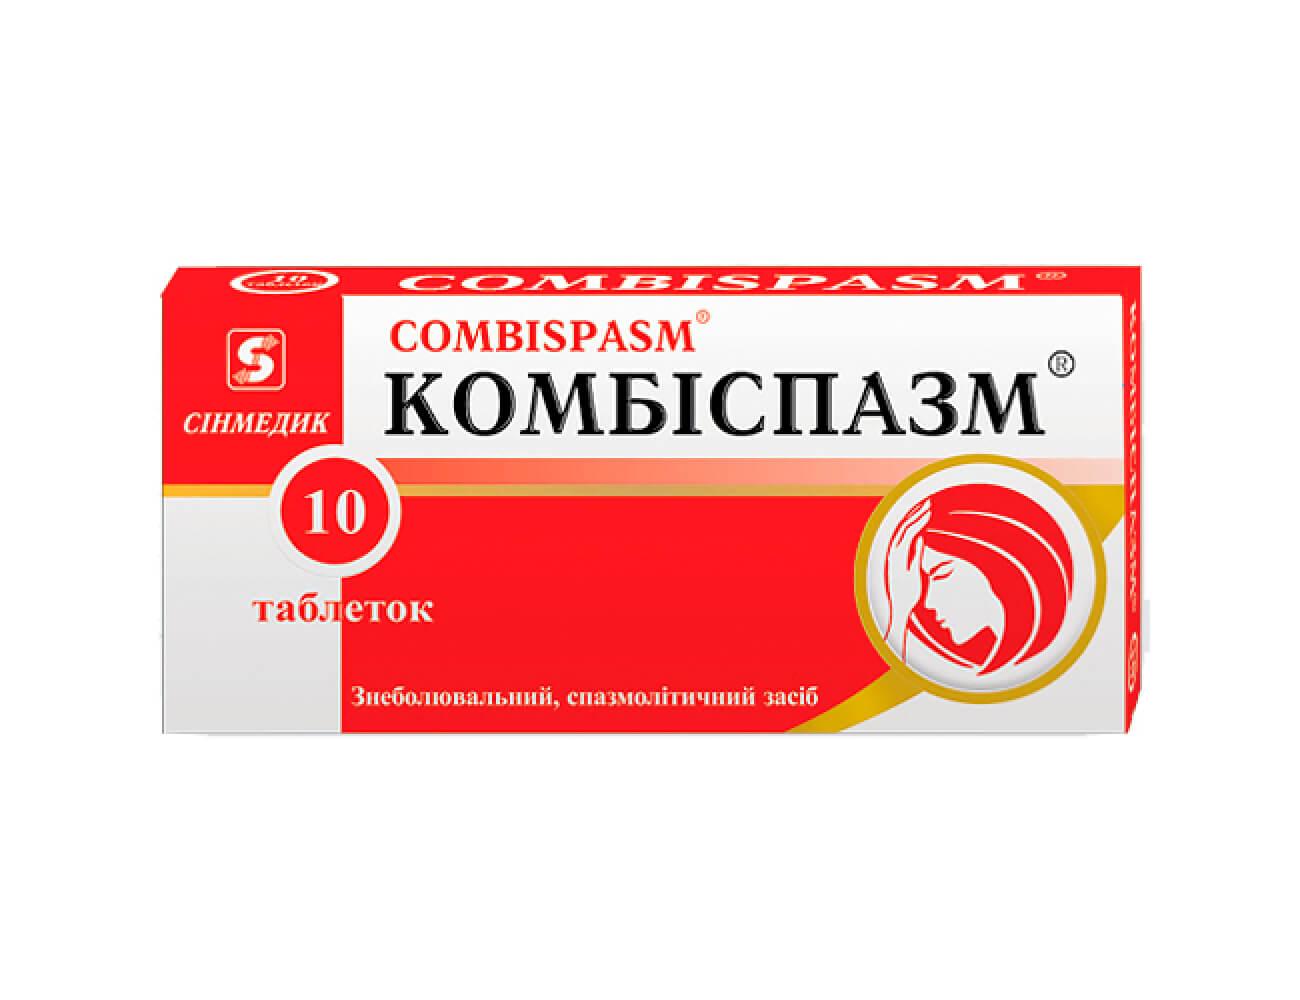 Комбиспазм: инструкция по применению таблеток